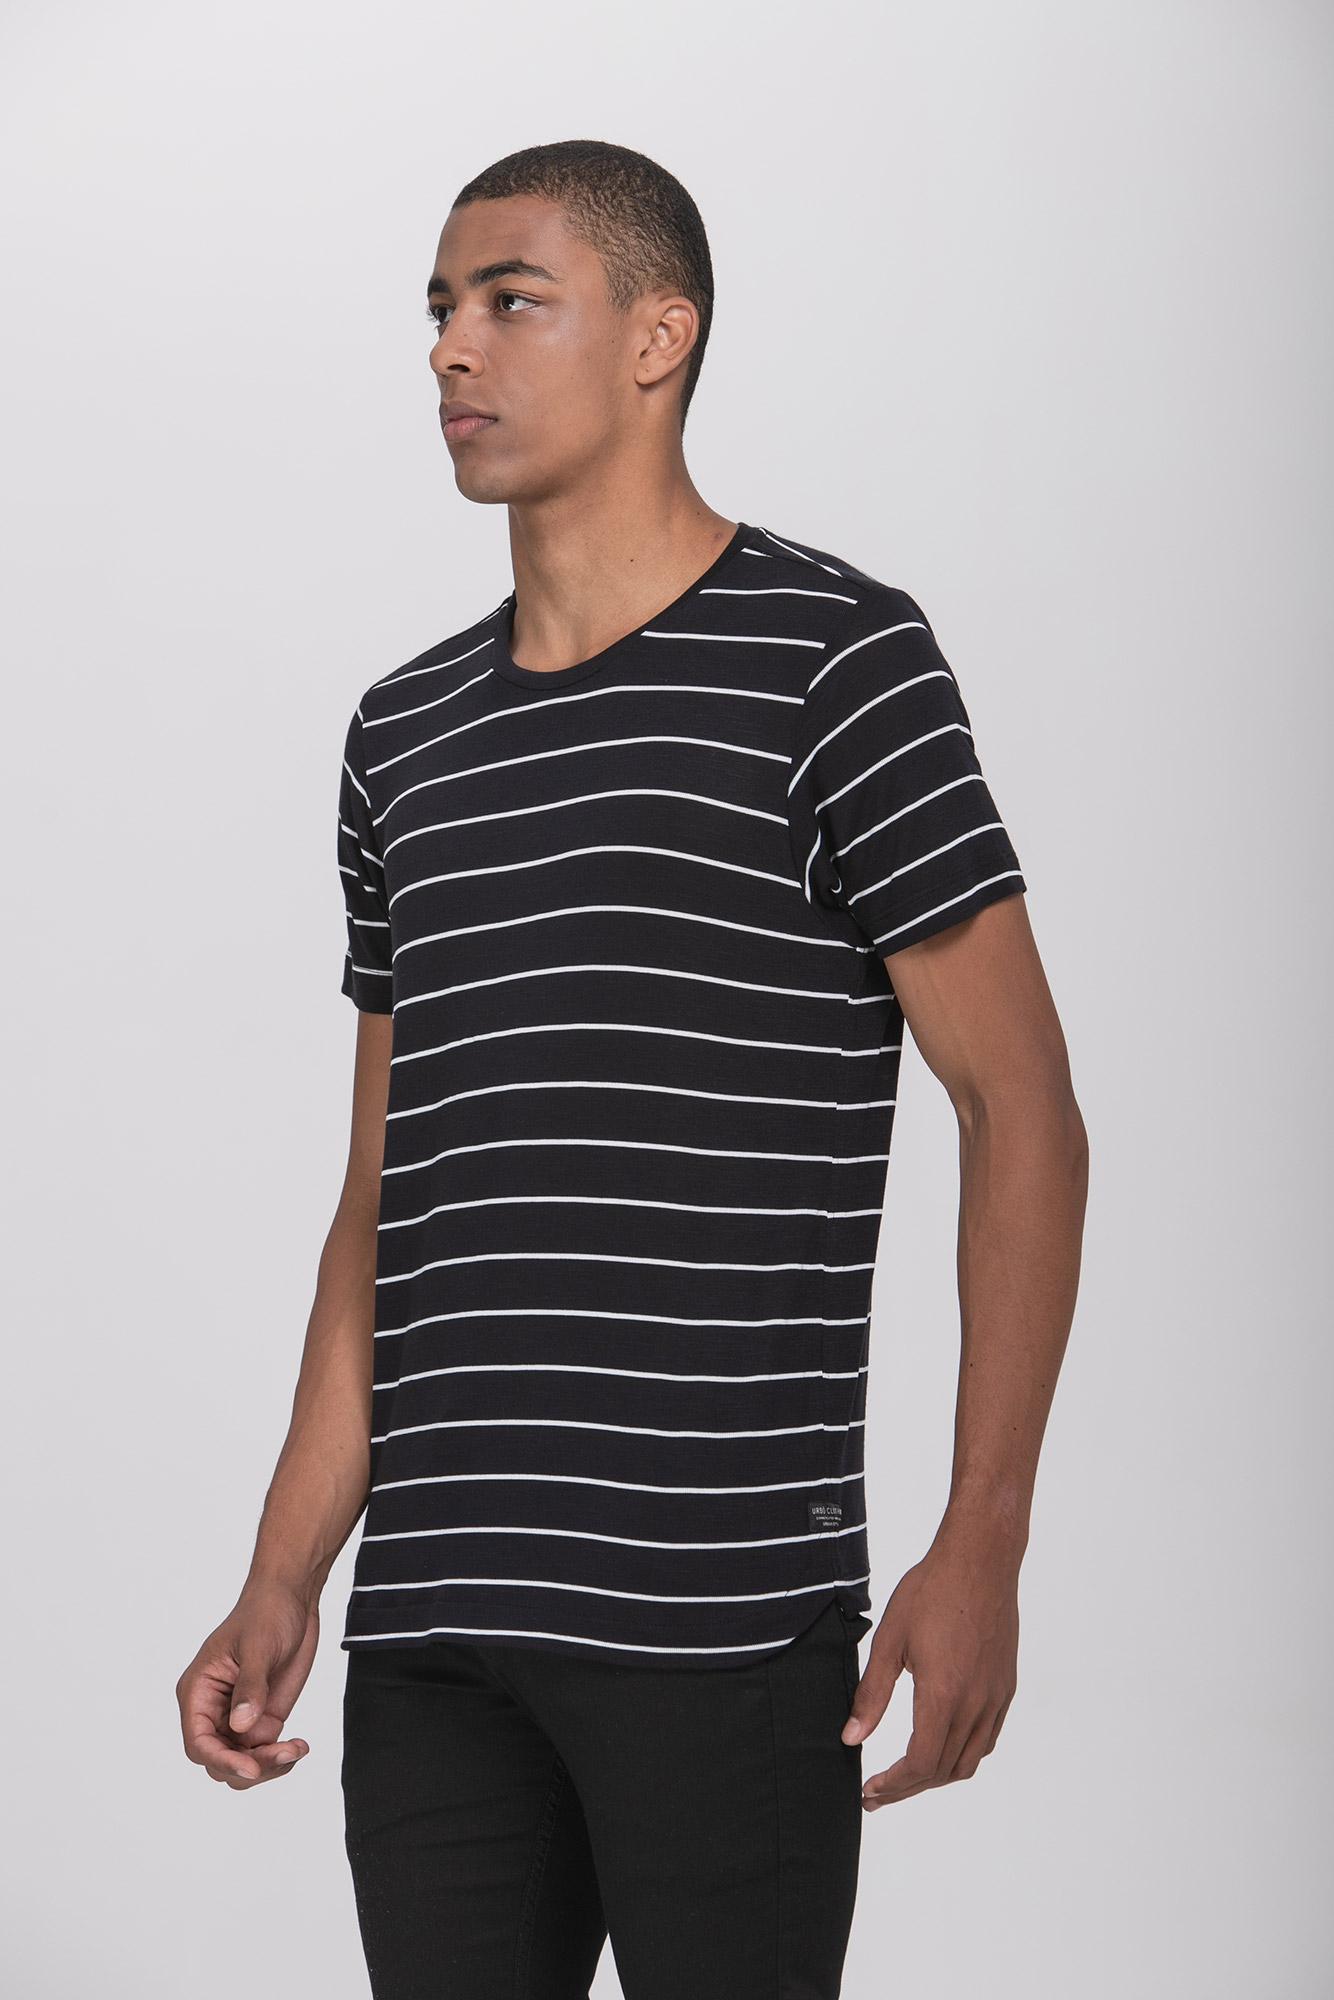 Camiseta Listrado Stripes